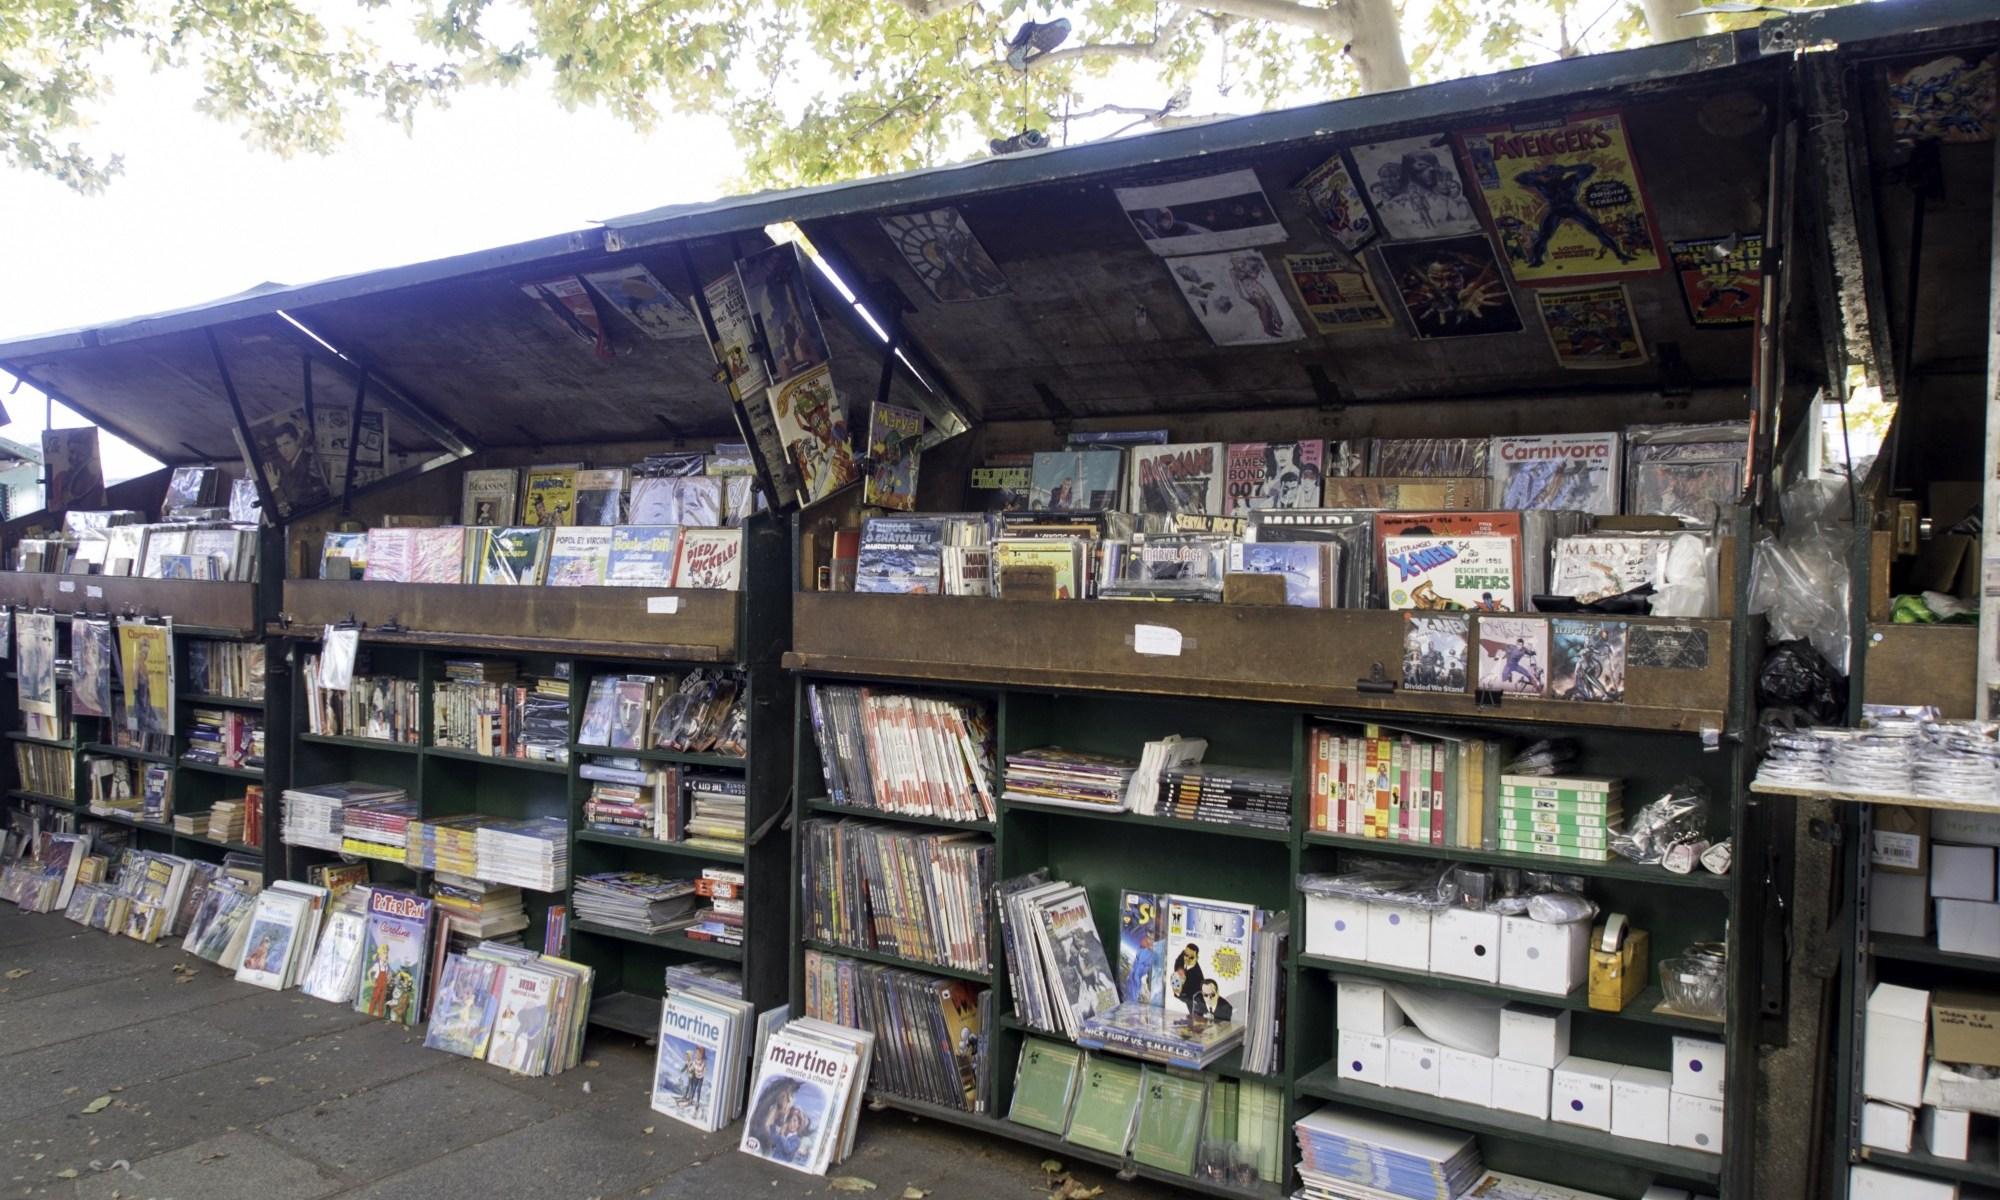 riverside book-stall in Paris